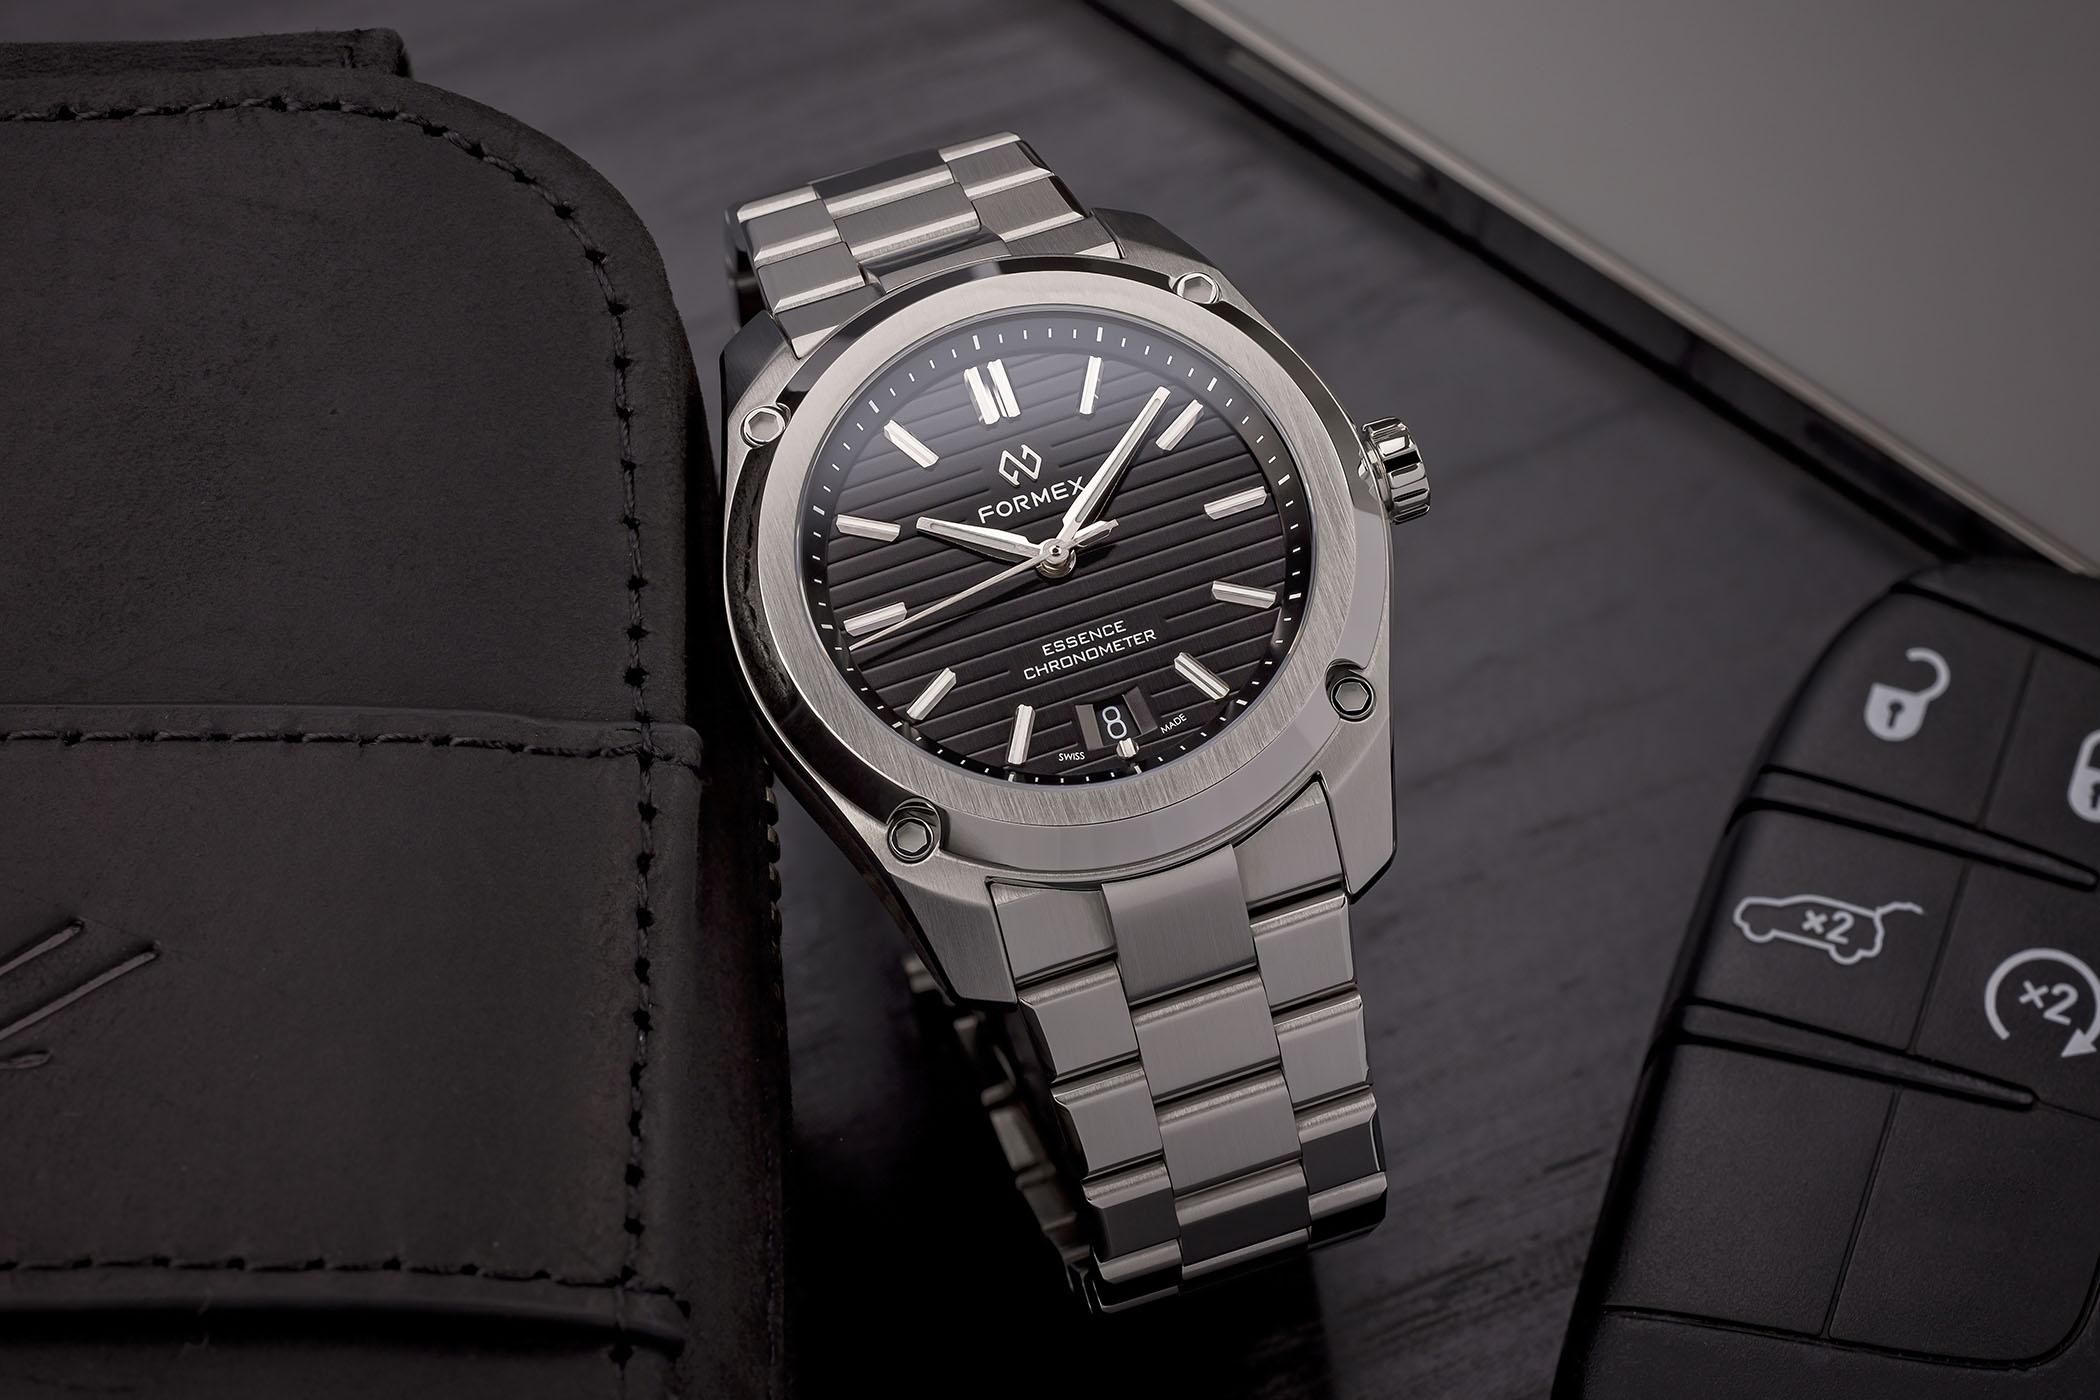 Formex Essence ThirtyNine Automatic Chronometer